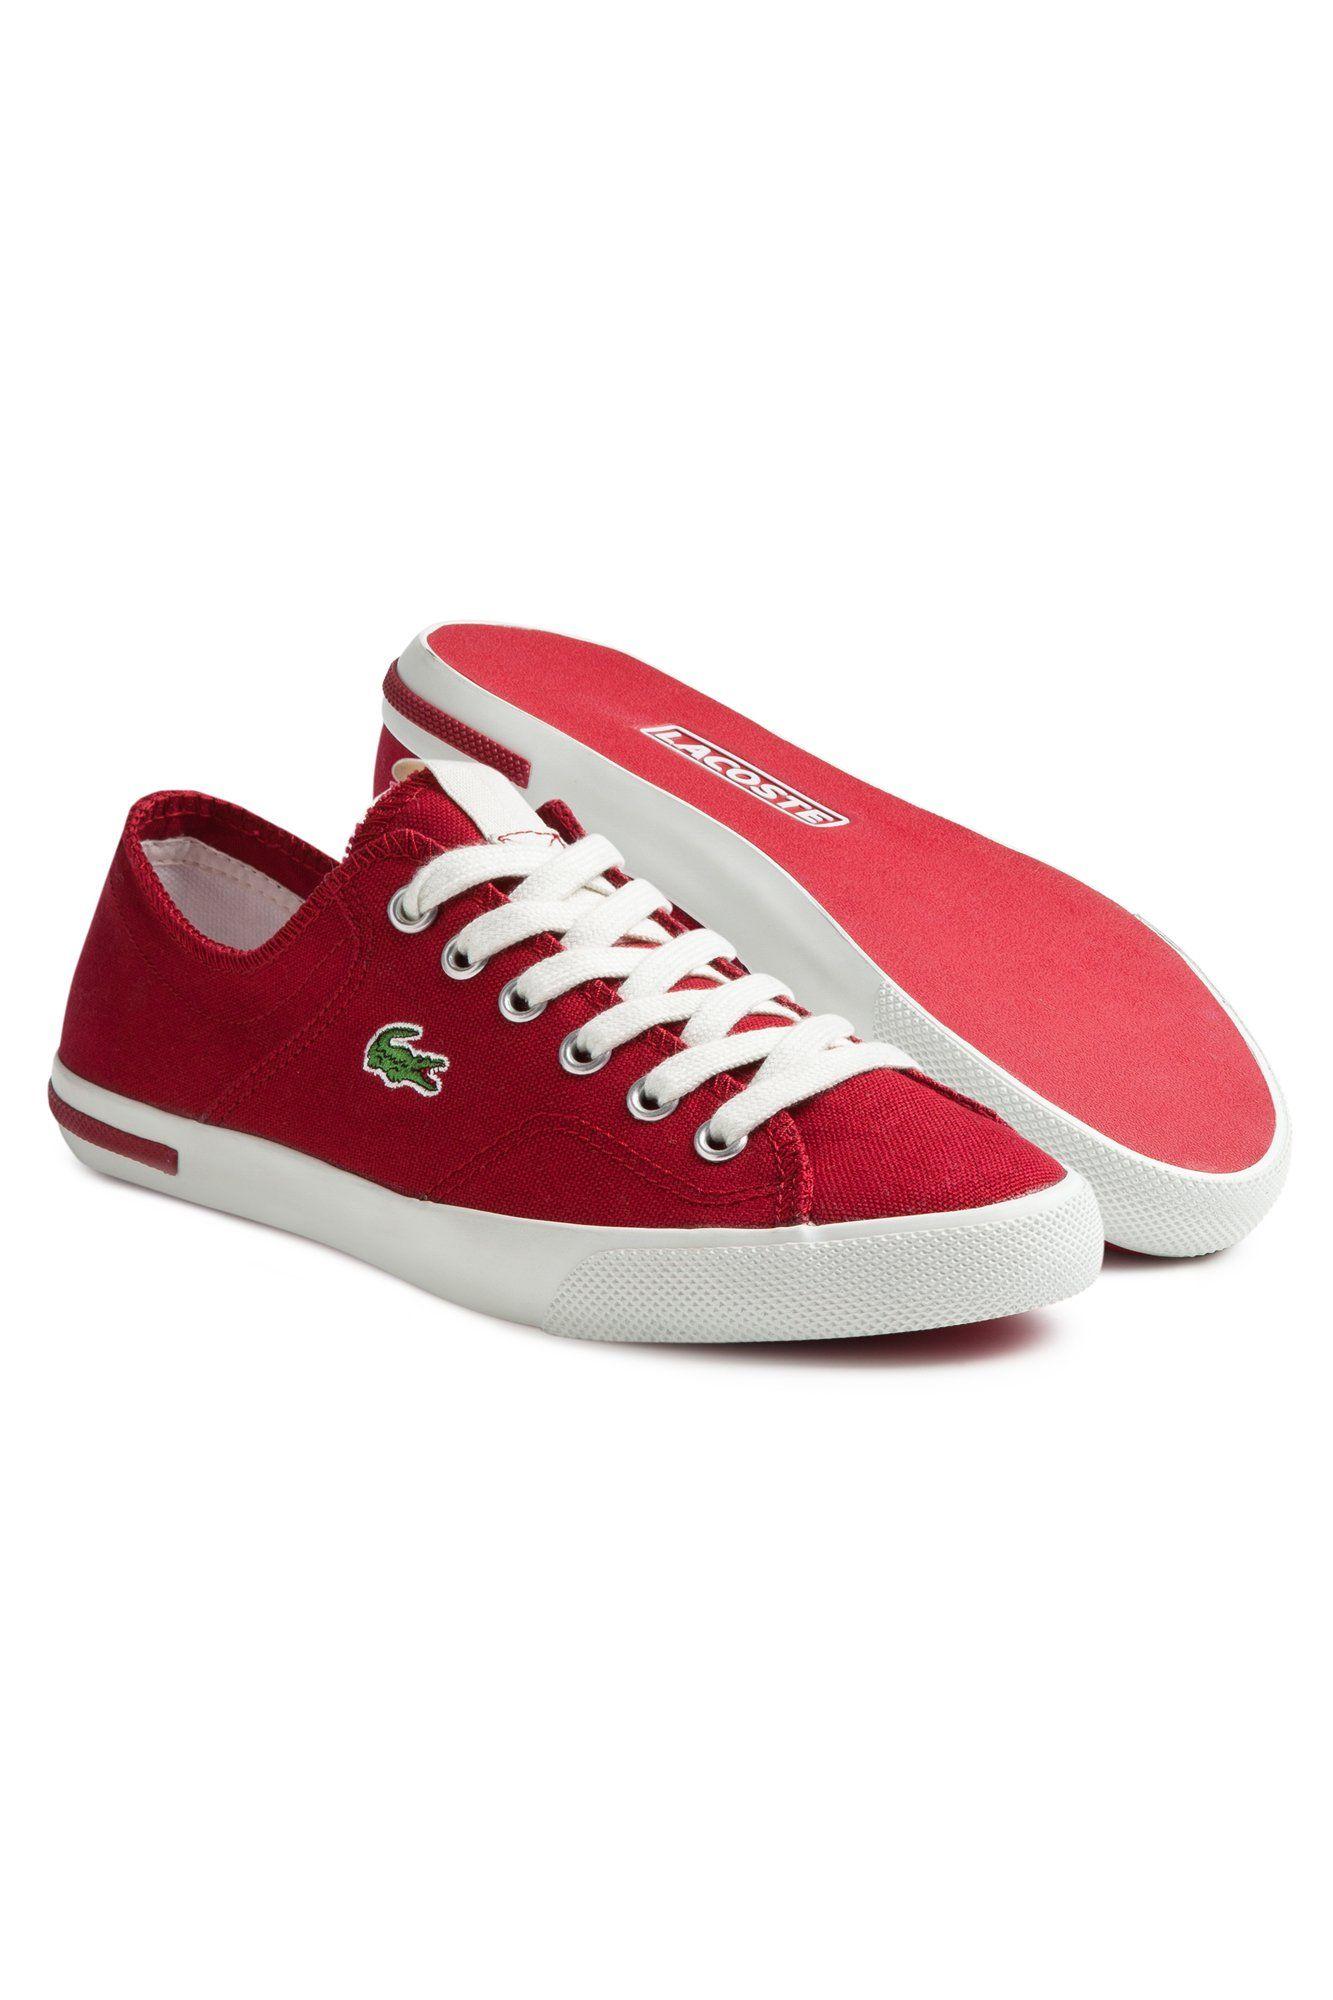 Womens lacoste sandals - Lacoste Women S Newton Ci